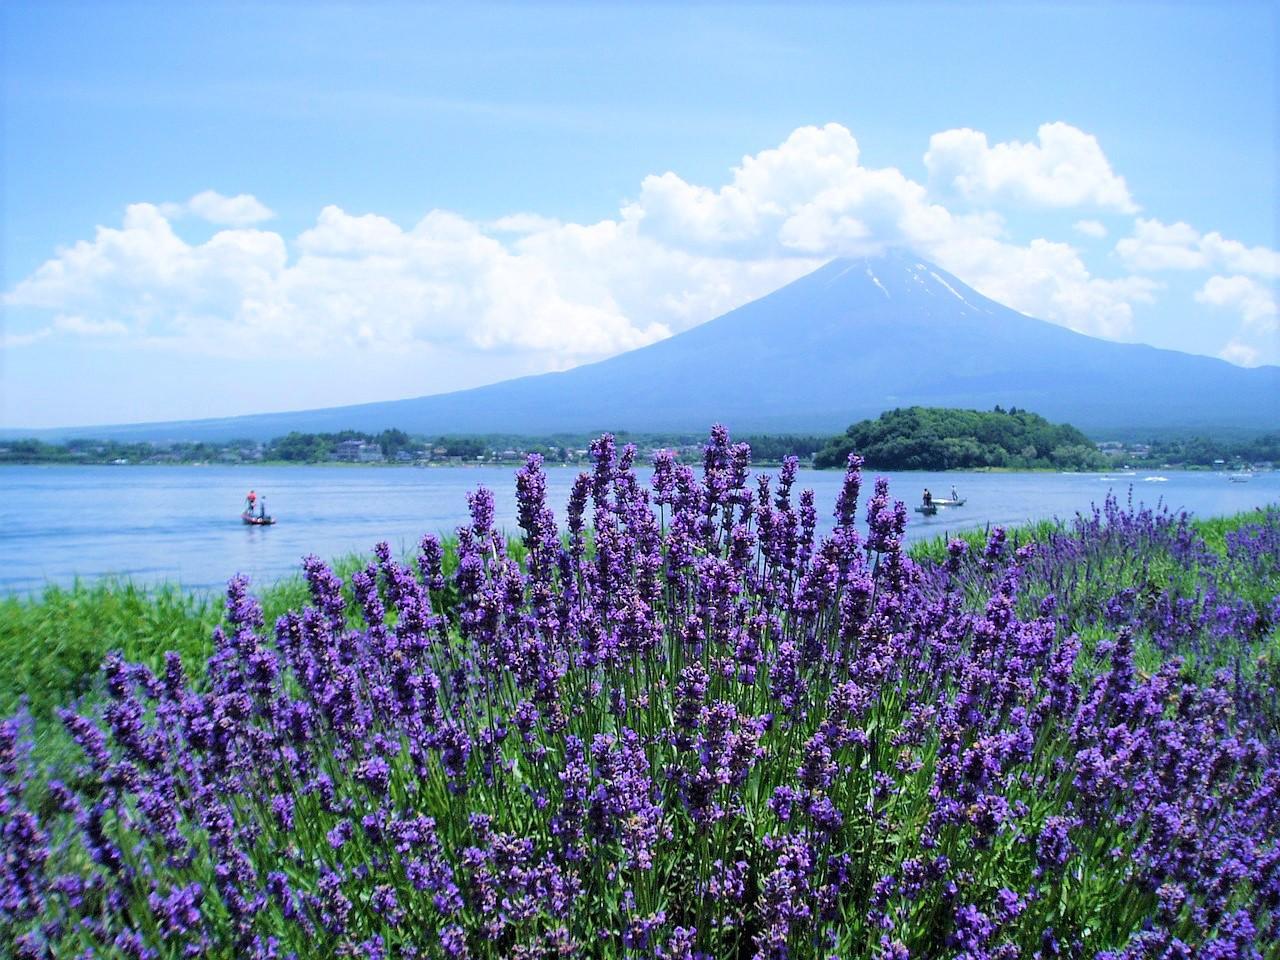 Fuji Kawaguchiko Herb Festival 2020